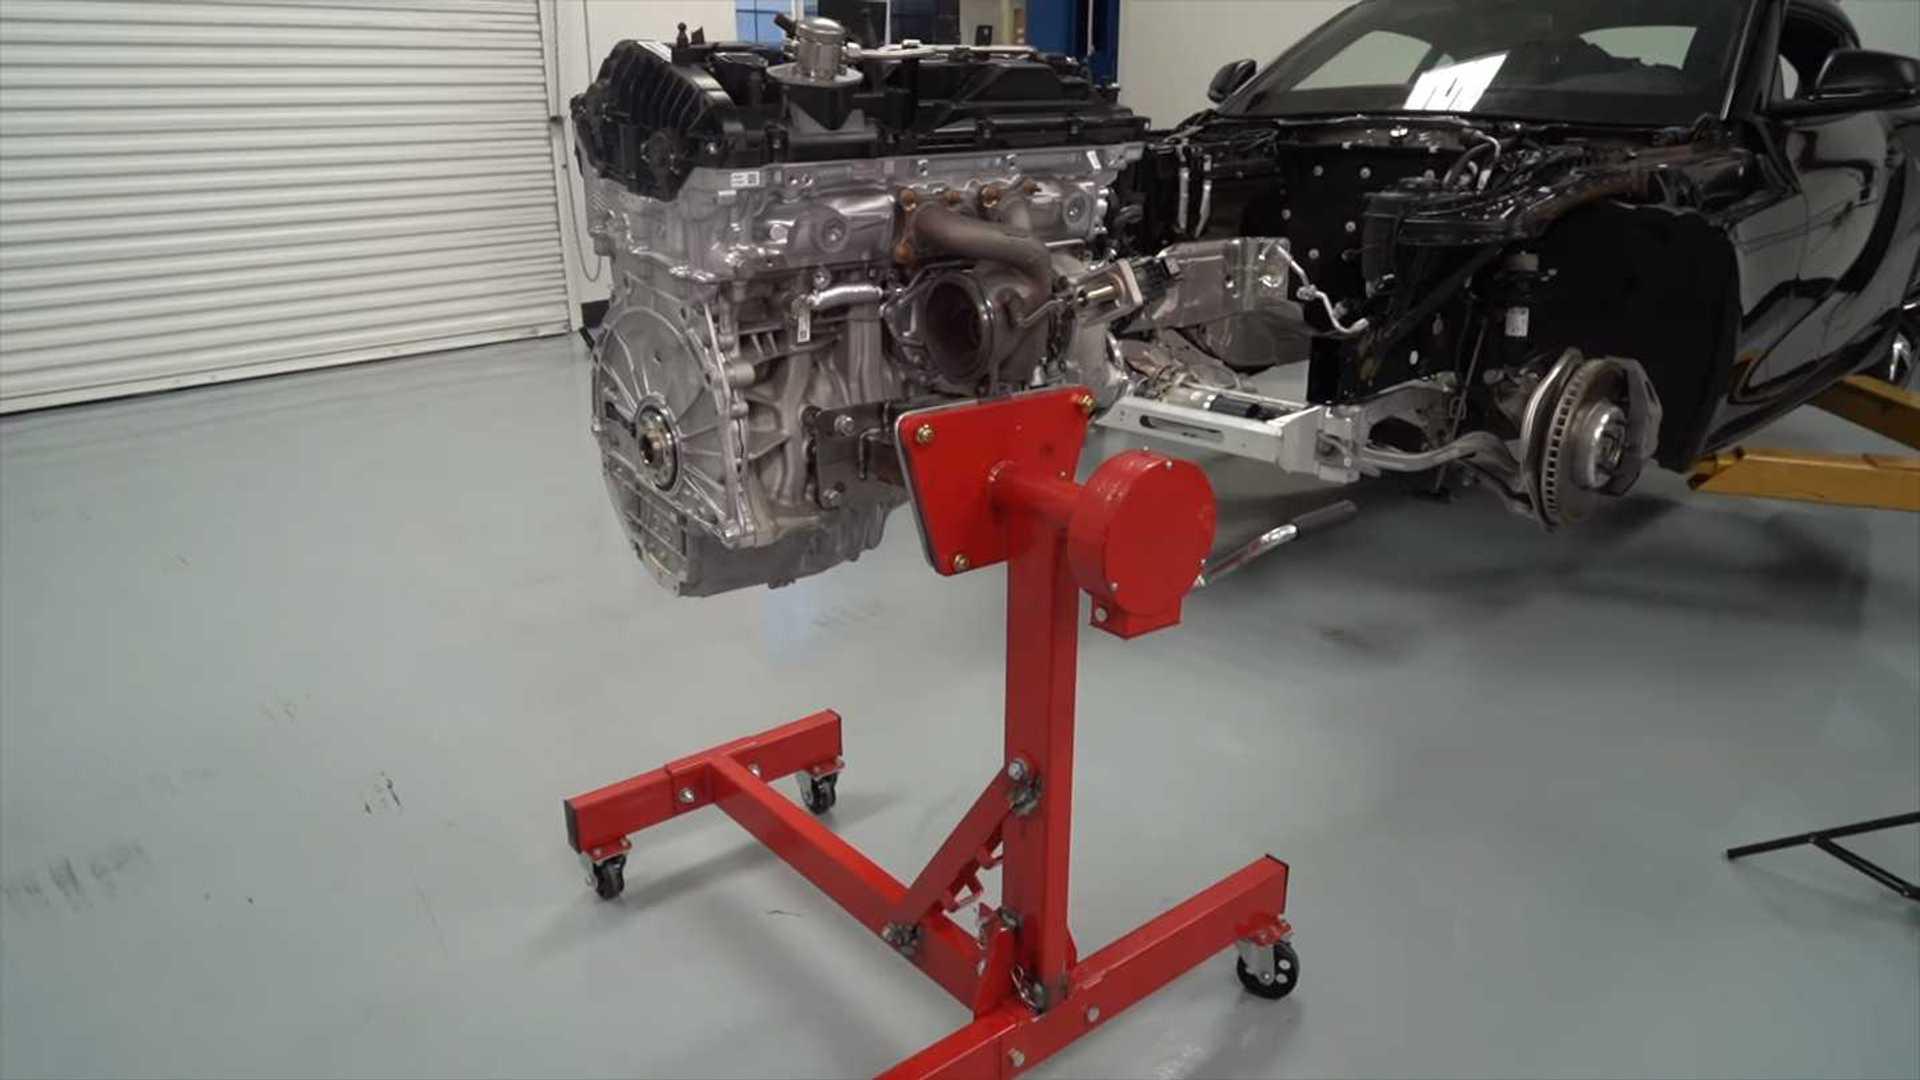 2020 Toyota Supra Engine Teardown Shows 1,000-HP Potential